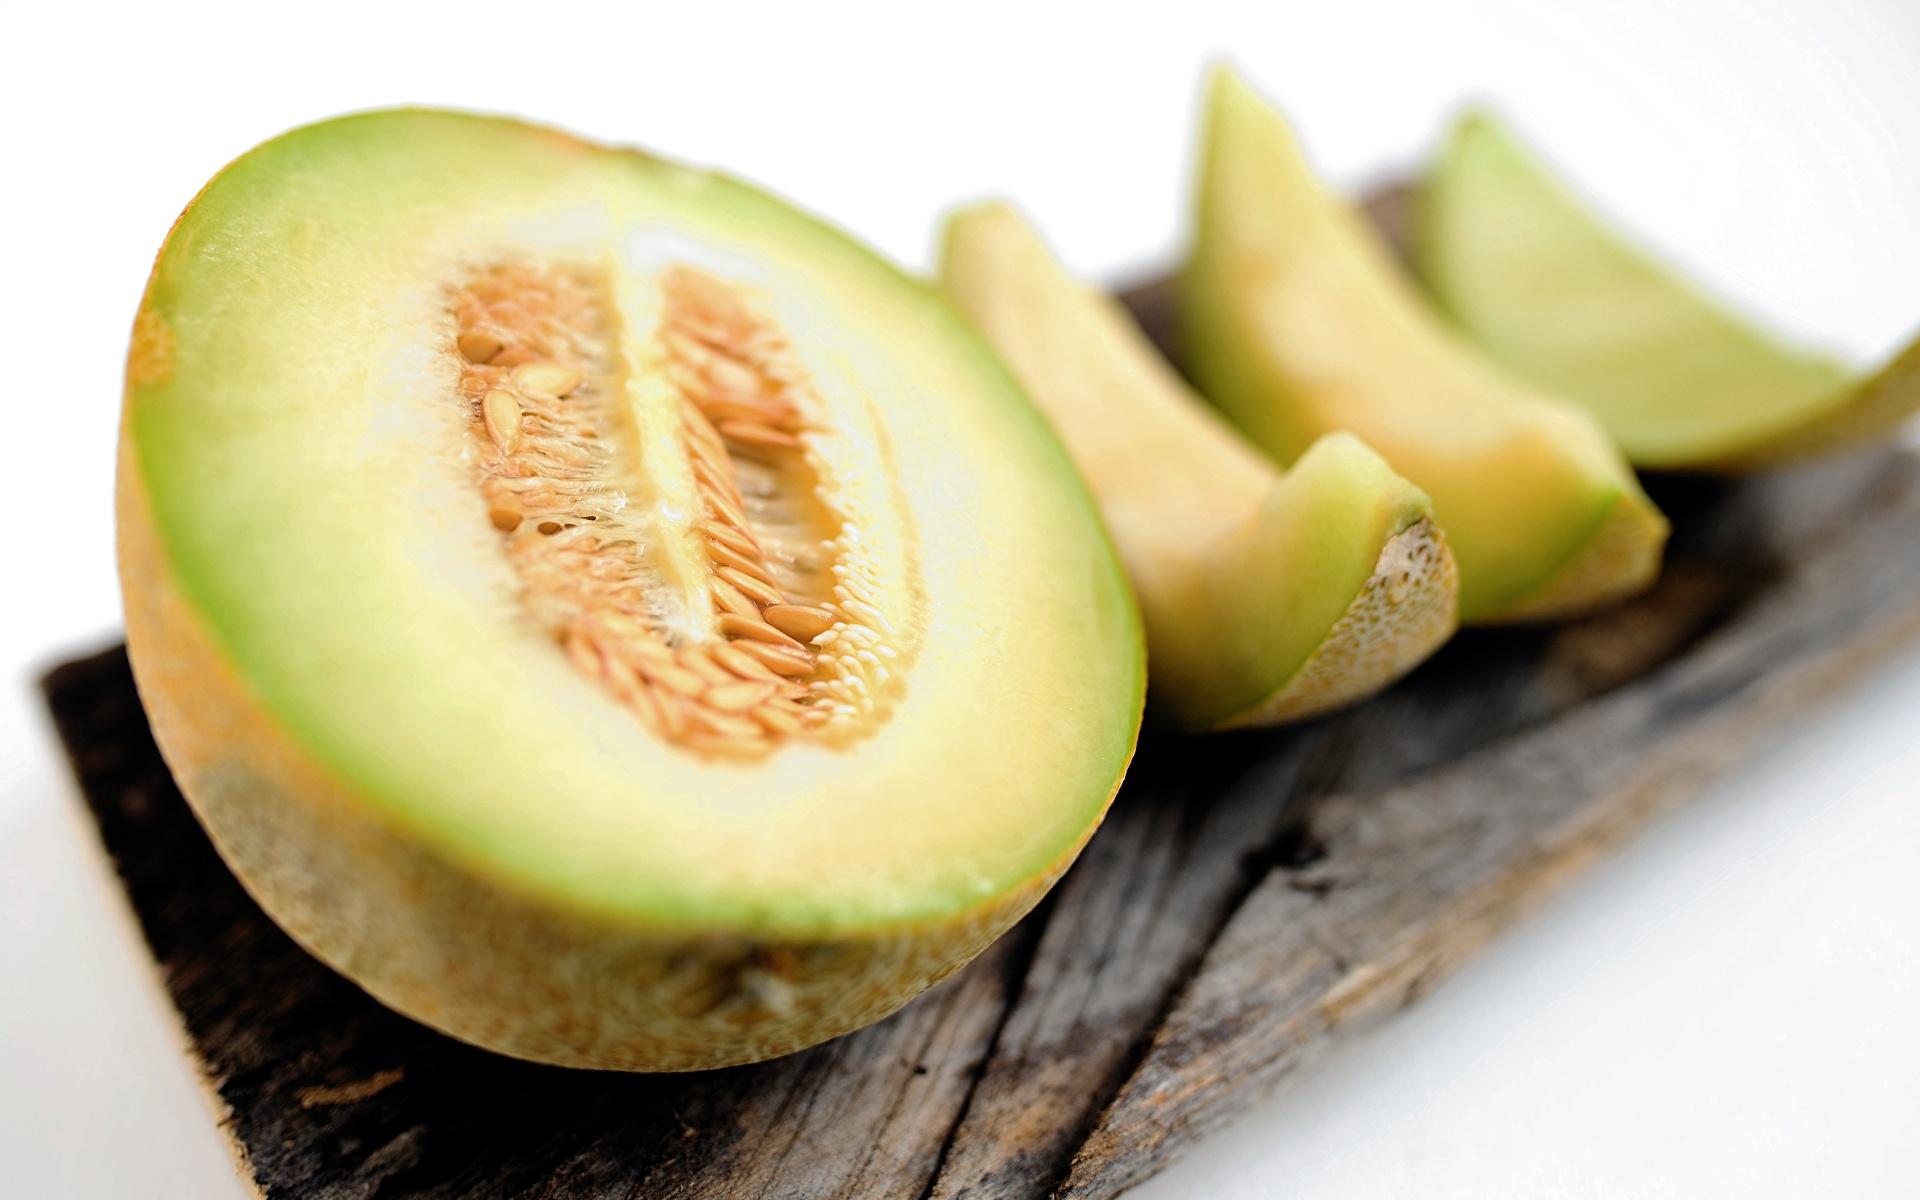 Bilder Bokeh Melone das Essen geschnittenes Nahaufnahme 1920x1200 unscharfer Hintergrund Geschnitten geschnittene Lebensmittel hautnah Großansicht